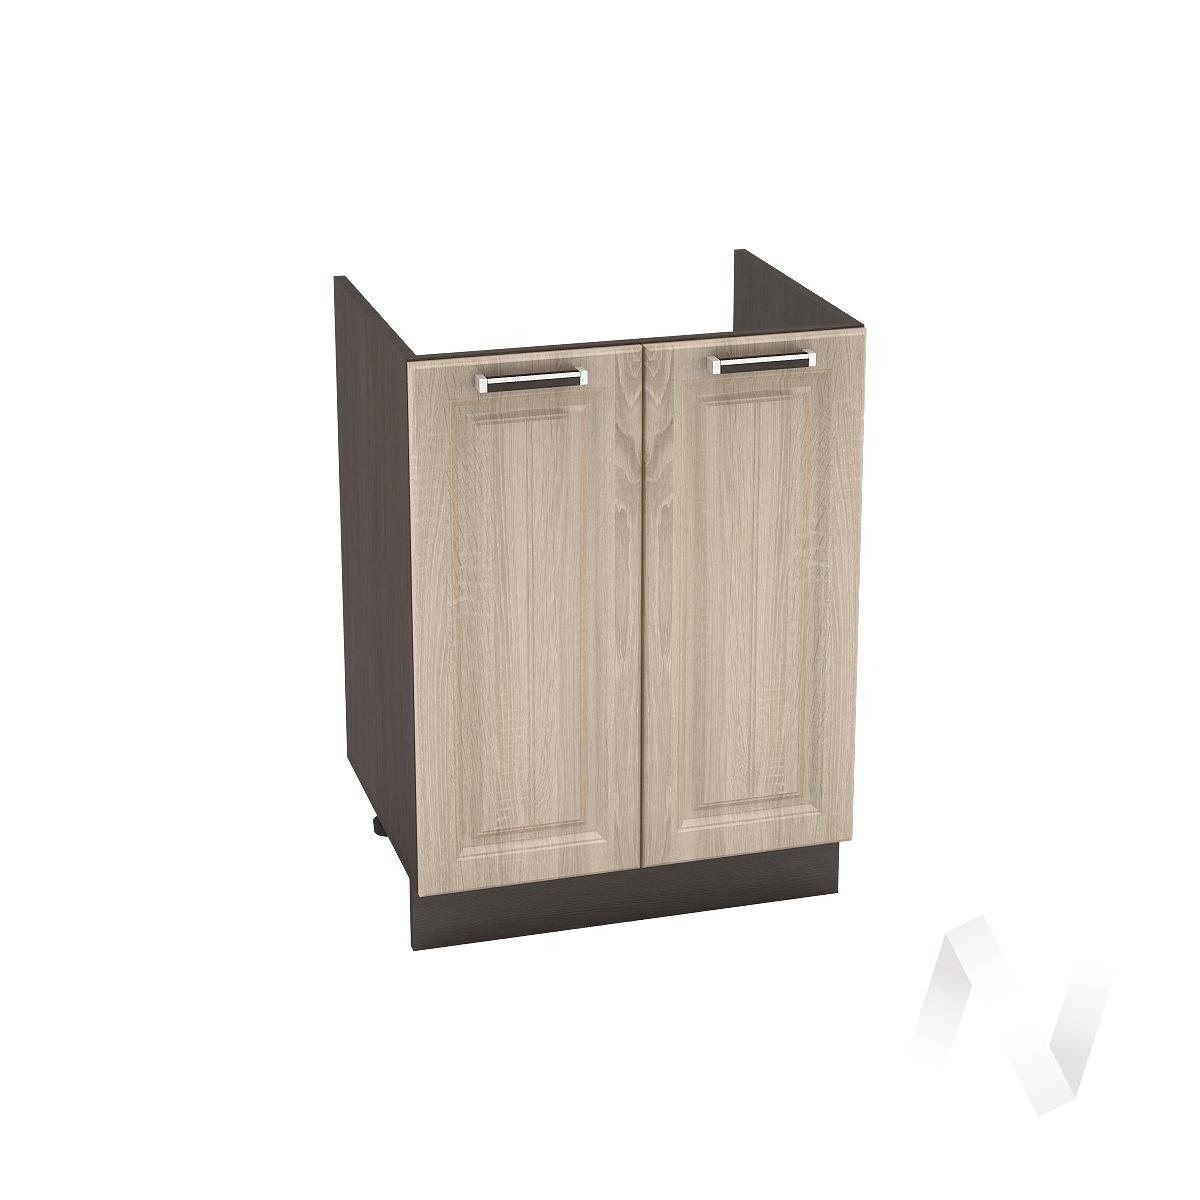 "Кухня ""Прага"": Шкаф нижний под мойку 600, ШНМ 600 новый (дуб сонома/корпус венге)"